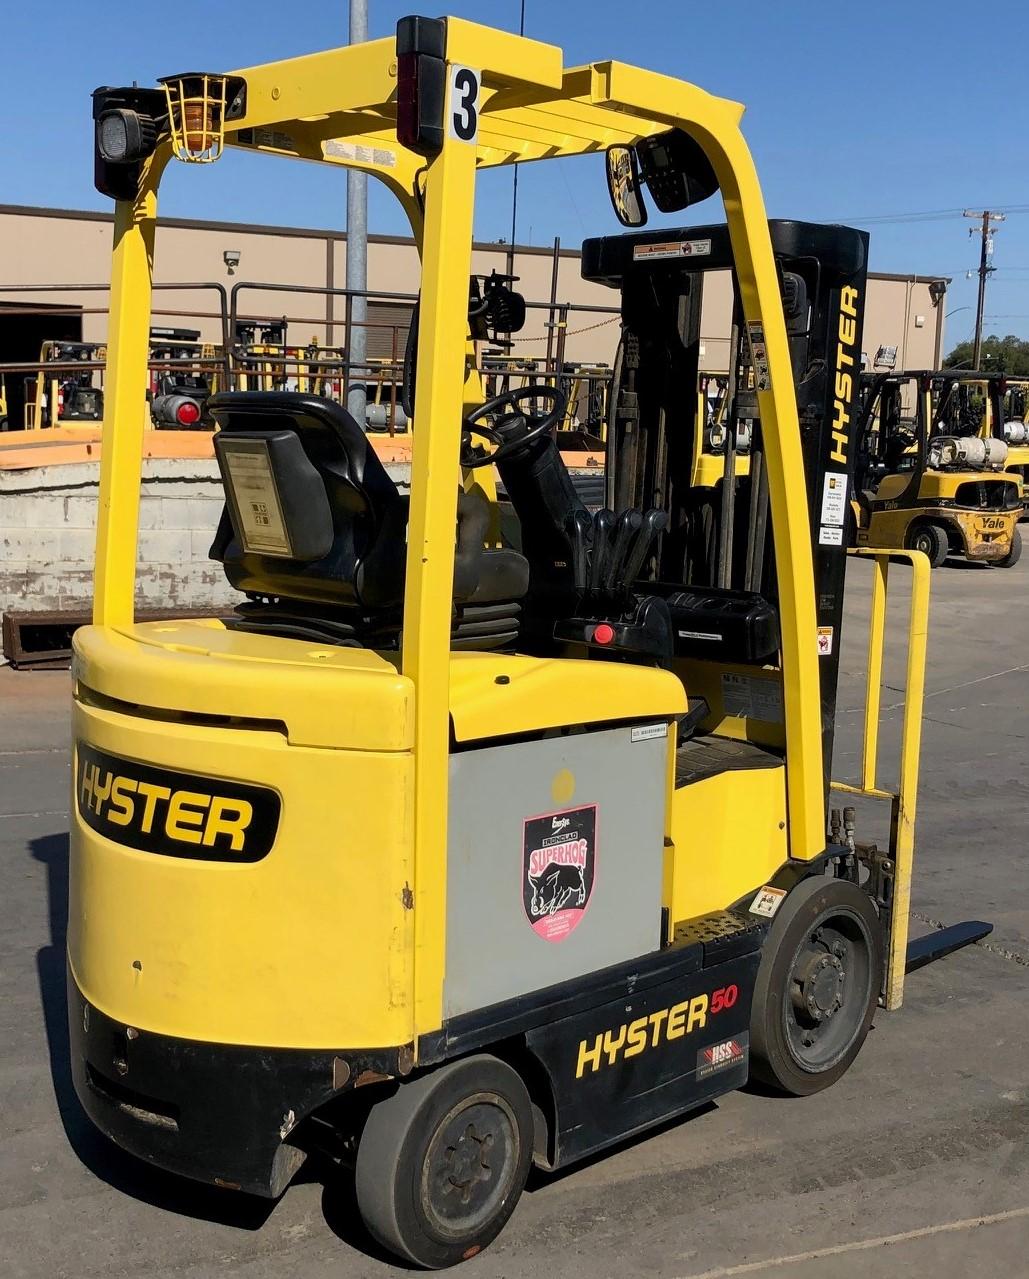 2014 Hyster® E50XN